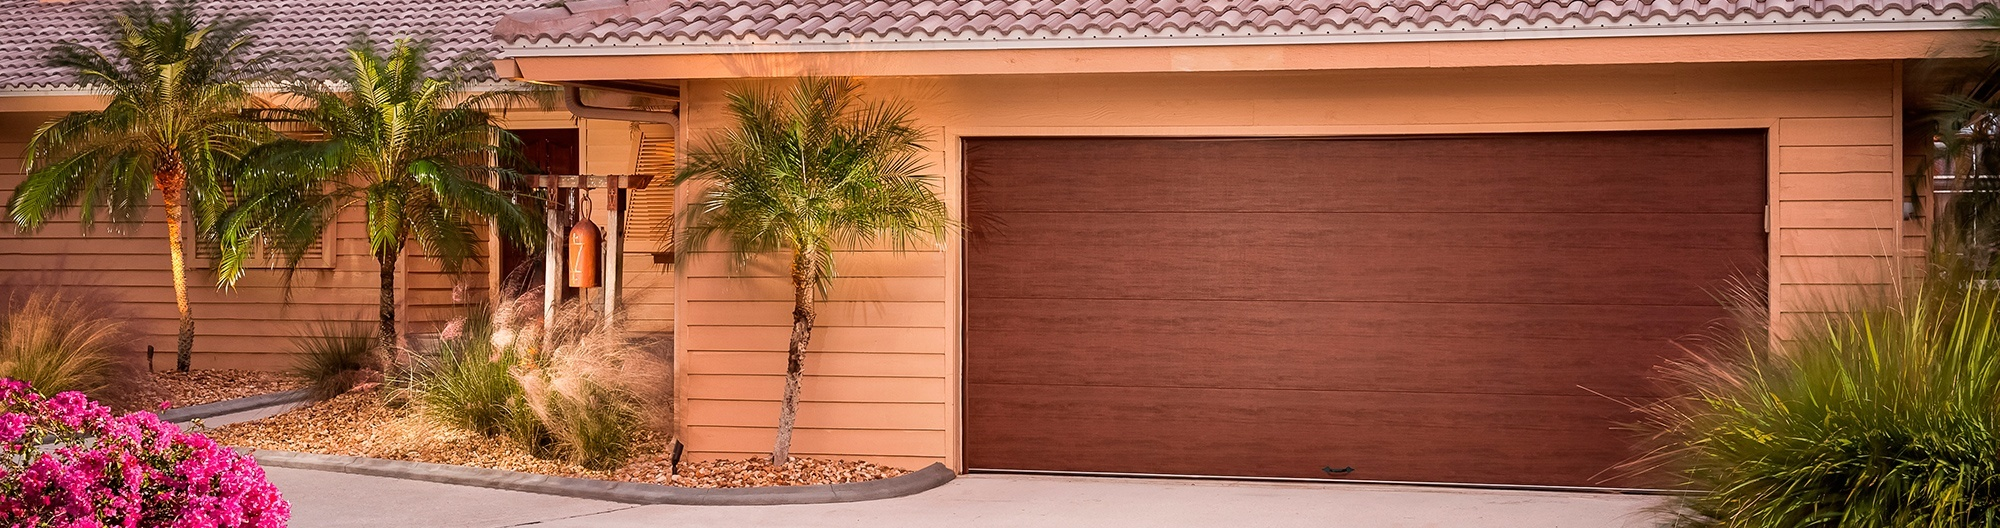 Hurricane Impact Garage Doors Adco